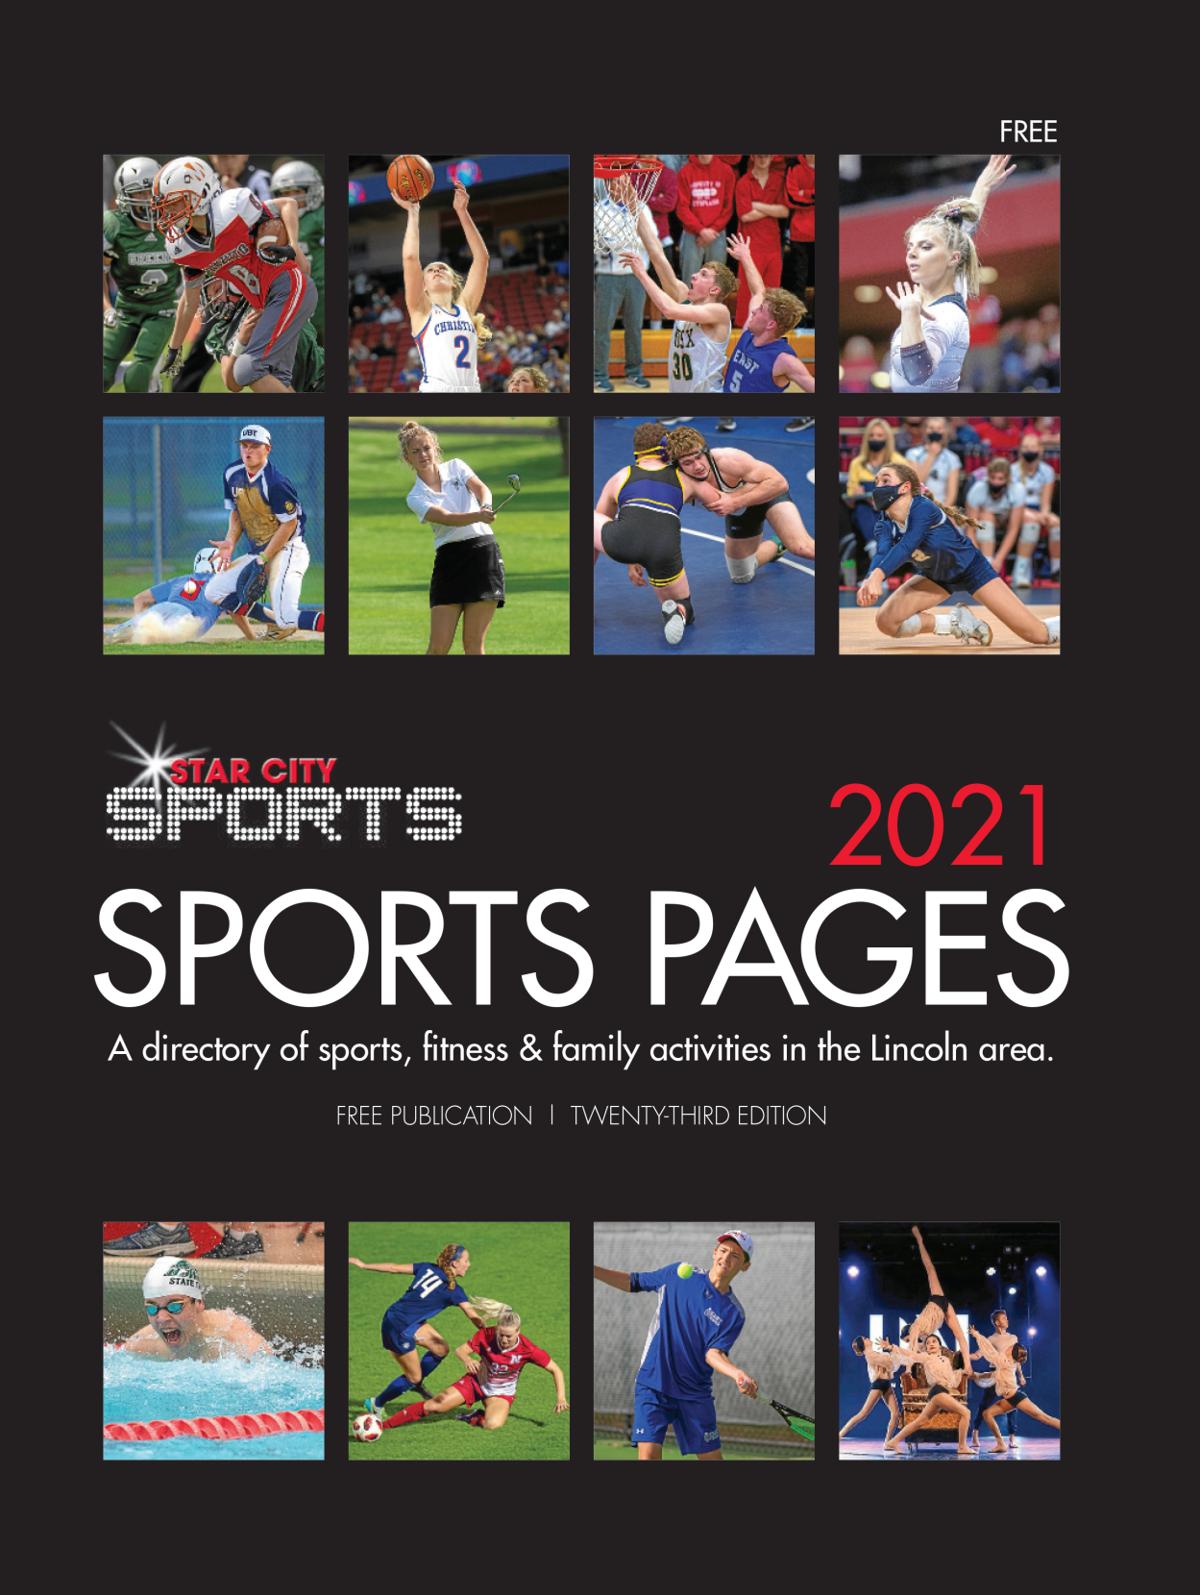 Star City Sports